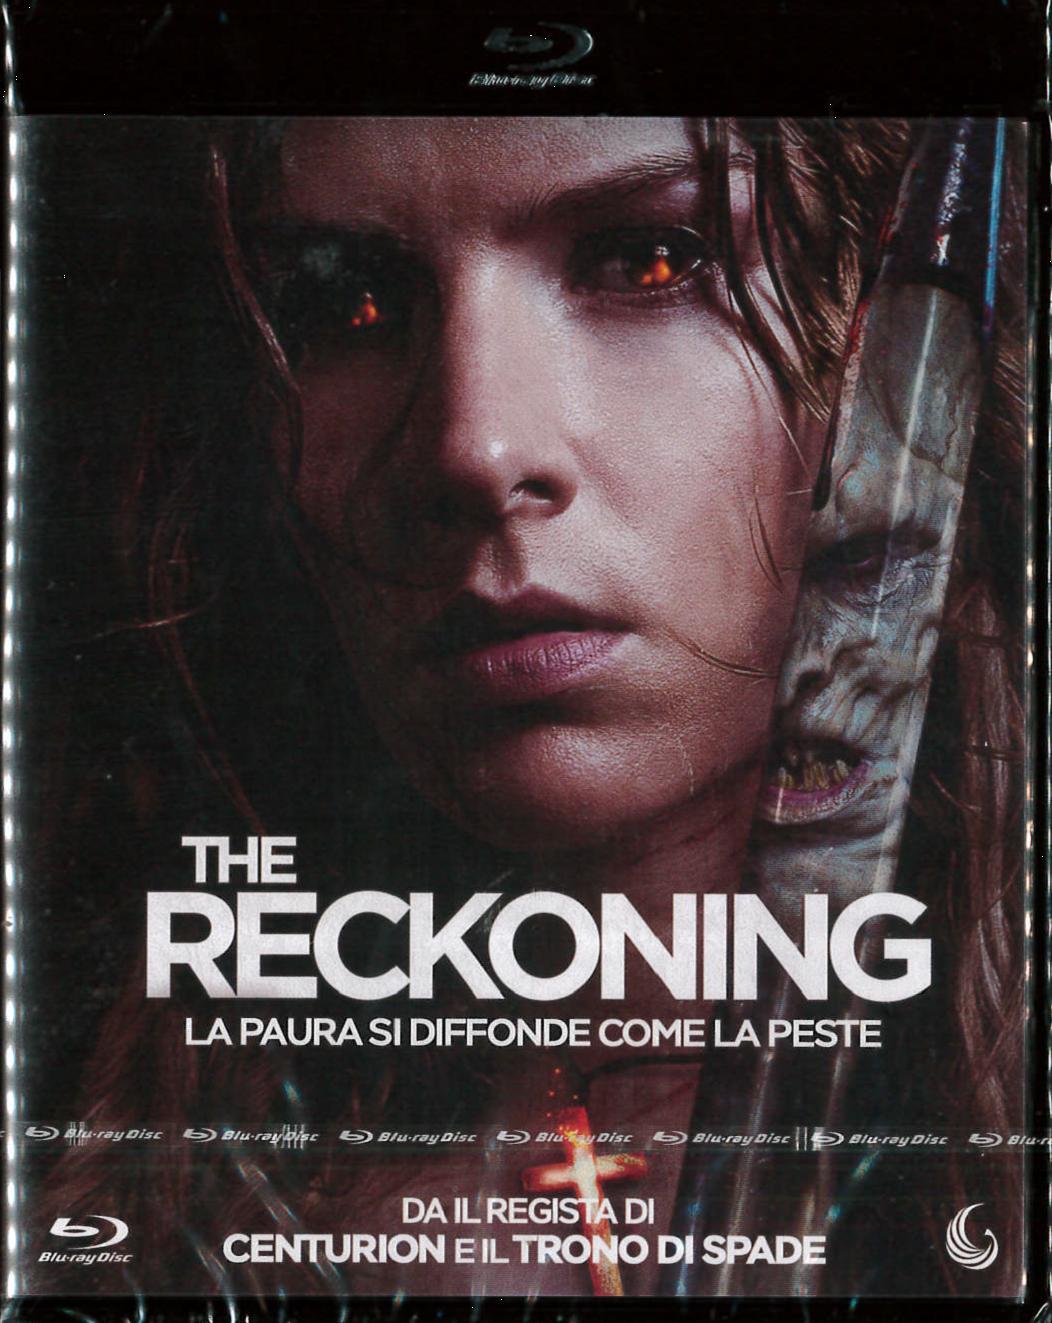 THE RECKONING - BLU RAY